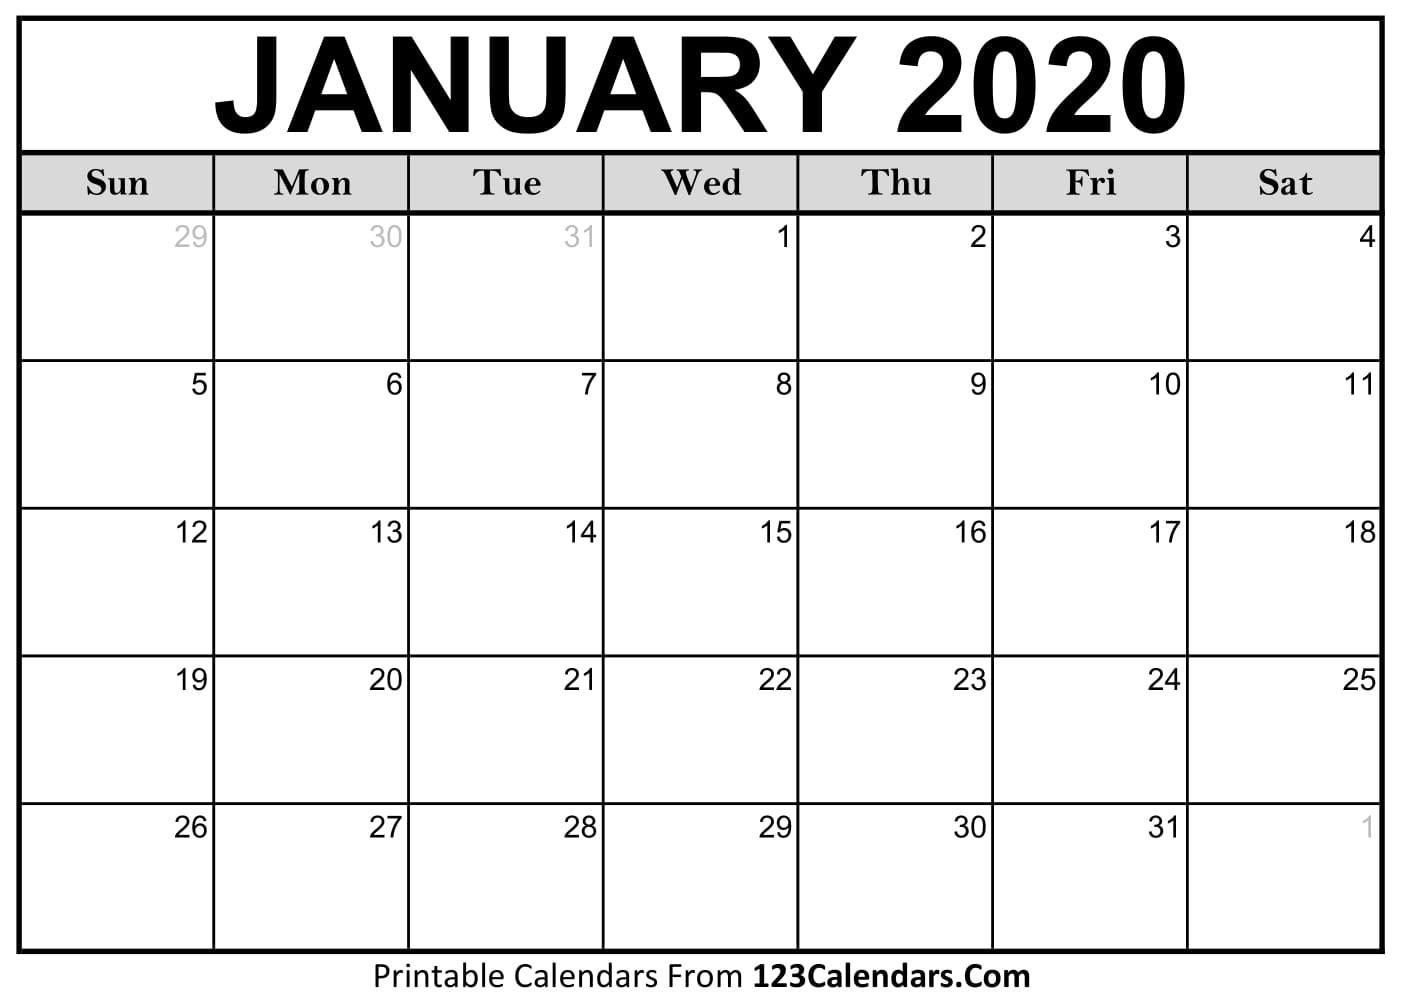 Free Printable Calendar | 123Calendars  Printable Calendar 2020